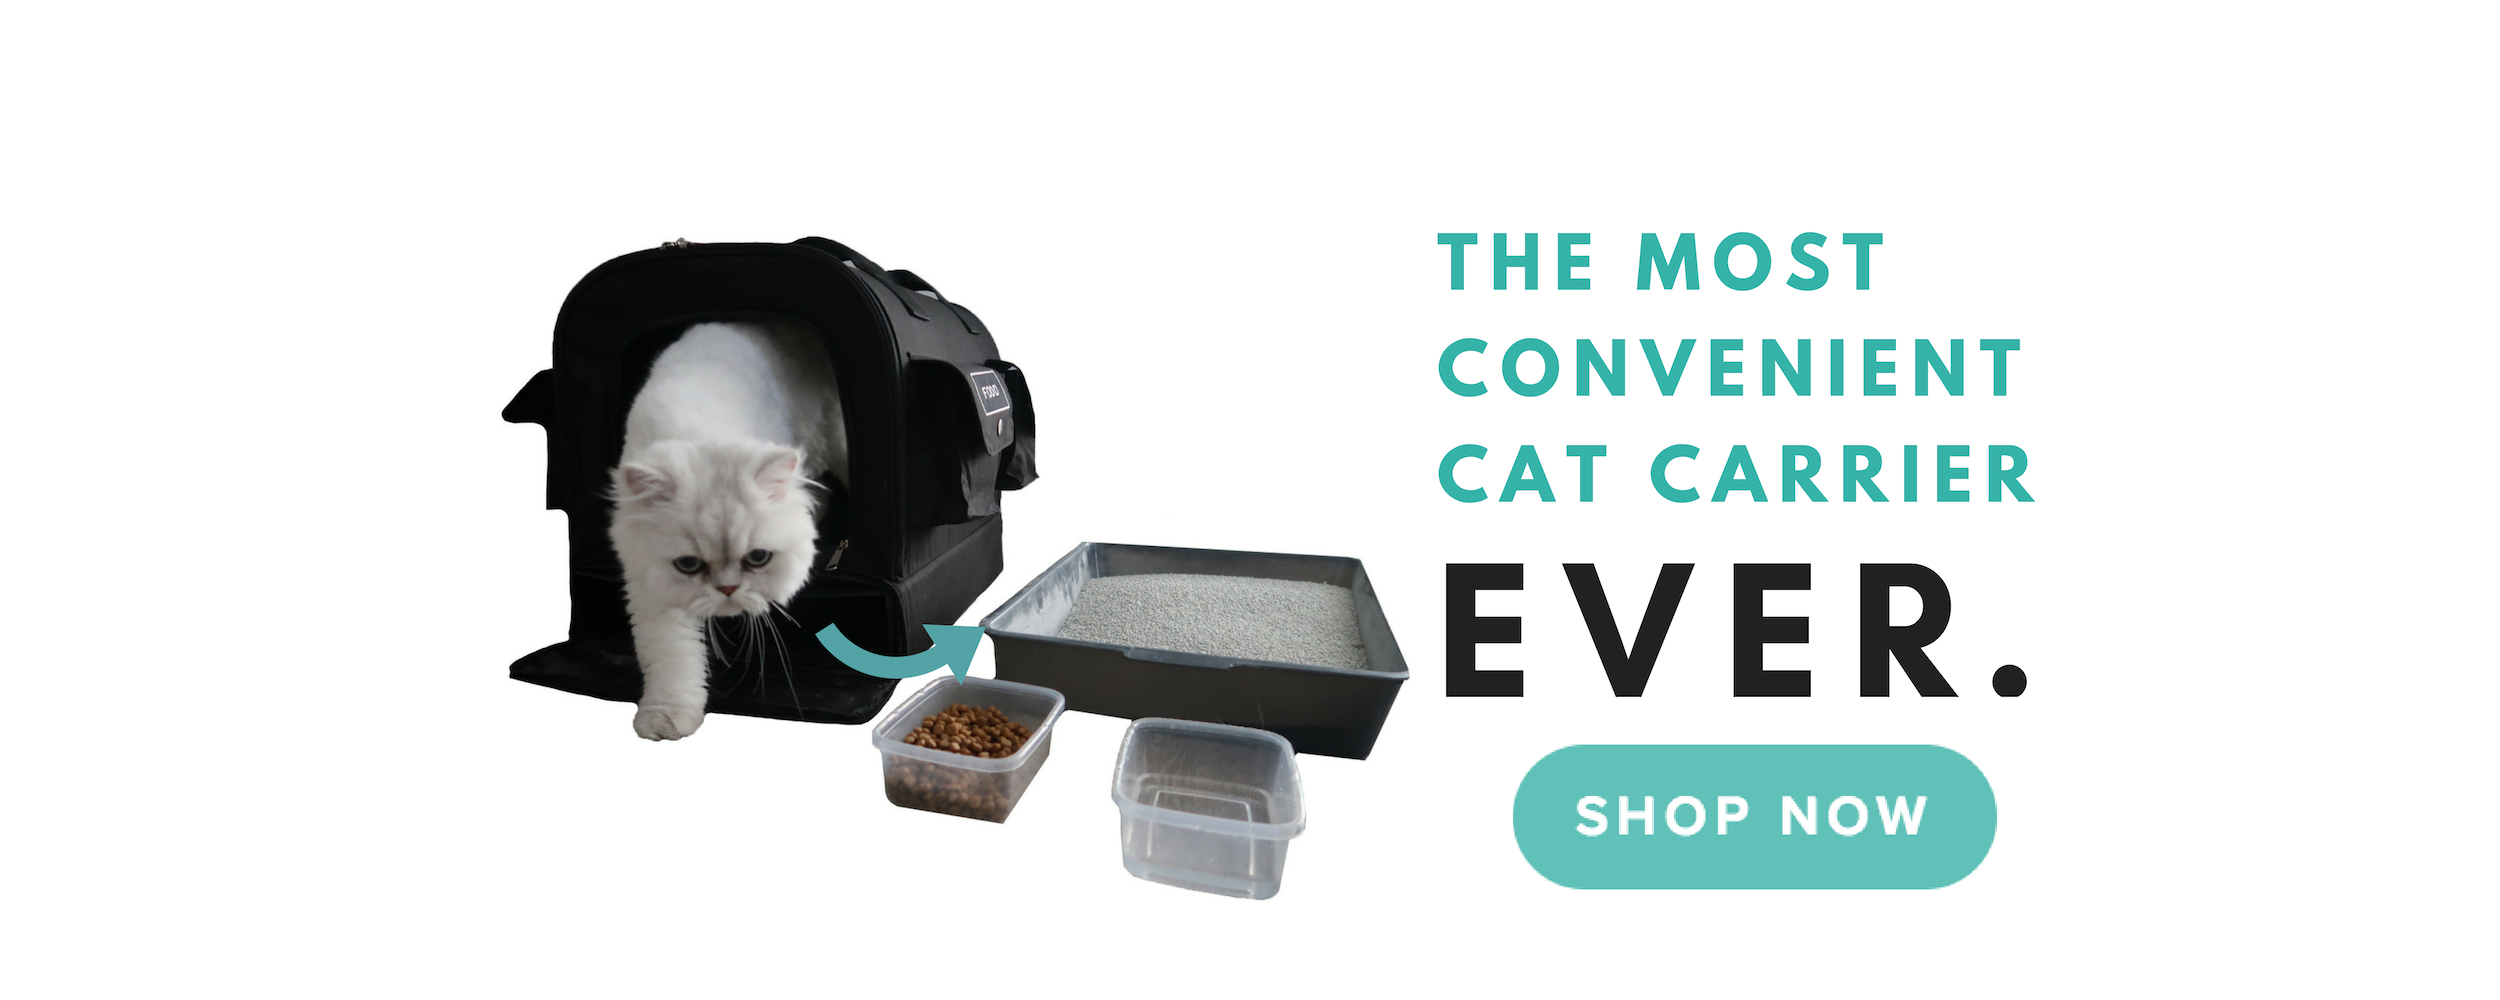 THE MOST CONVENIENT CAT CARRIER.png